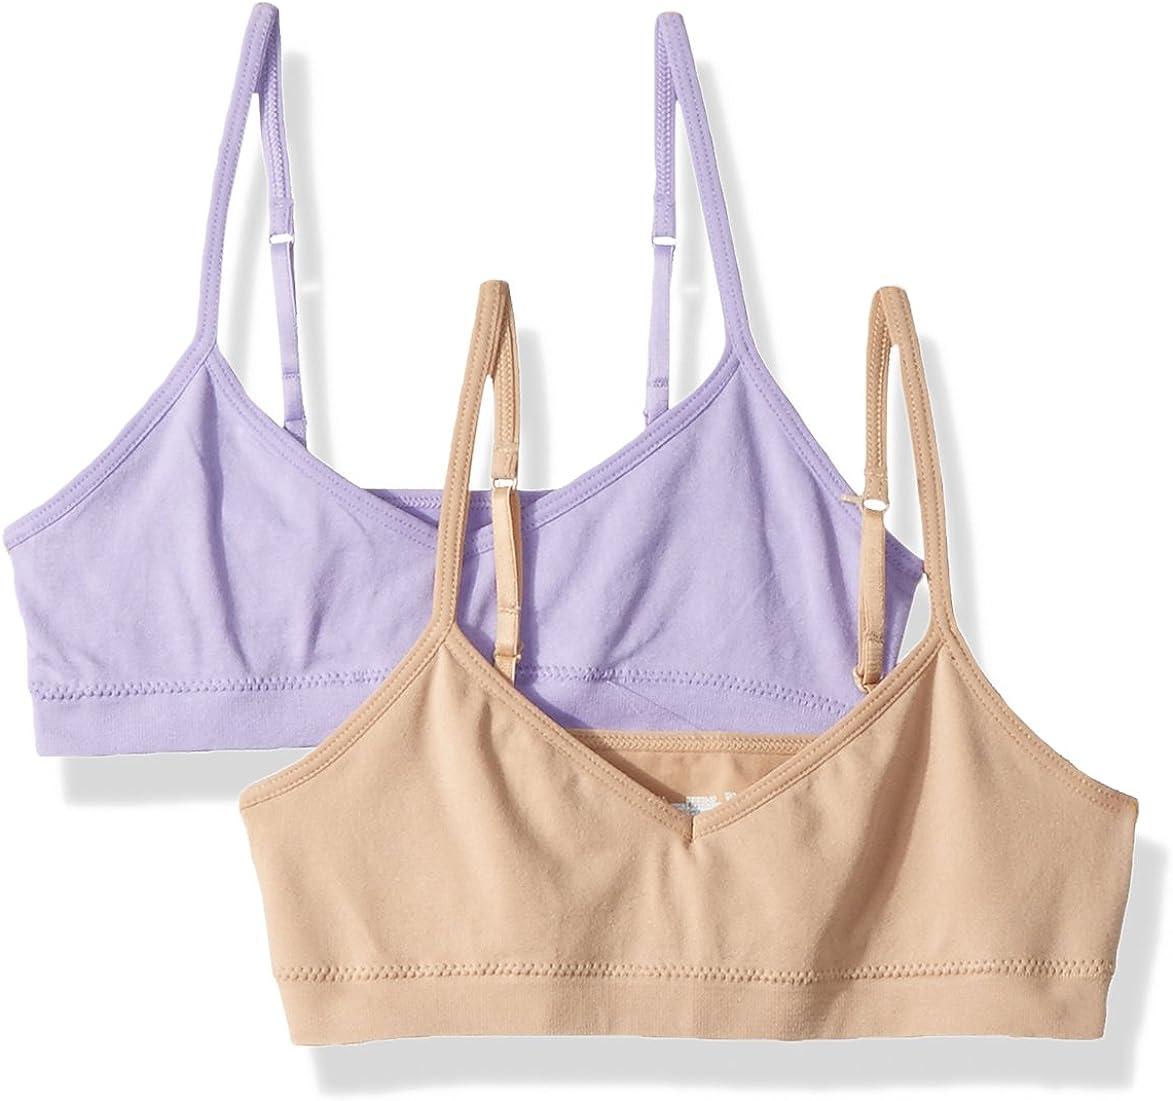 Hanes Big Girls ComfortFlex Seamless Bralette 2-Pack,